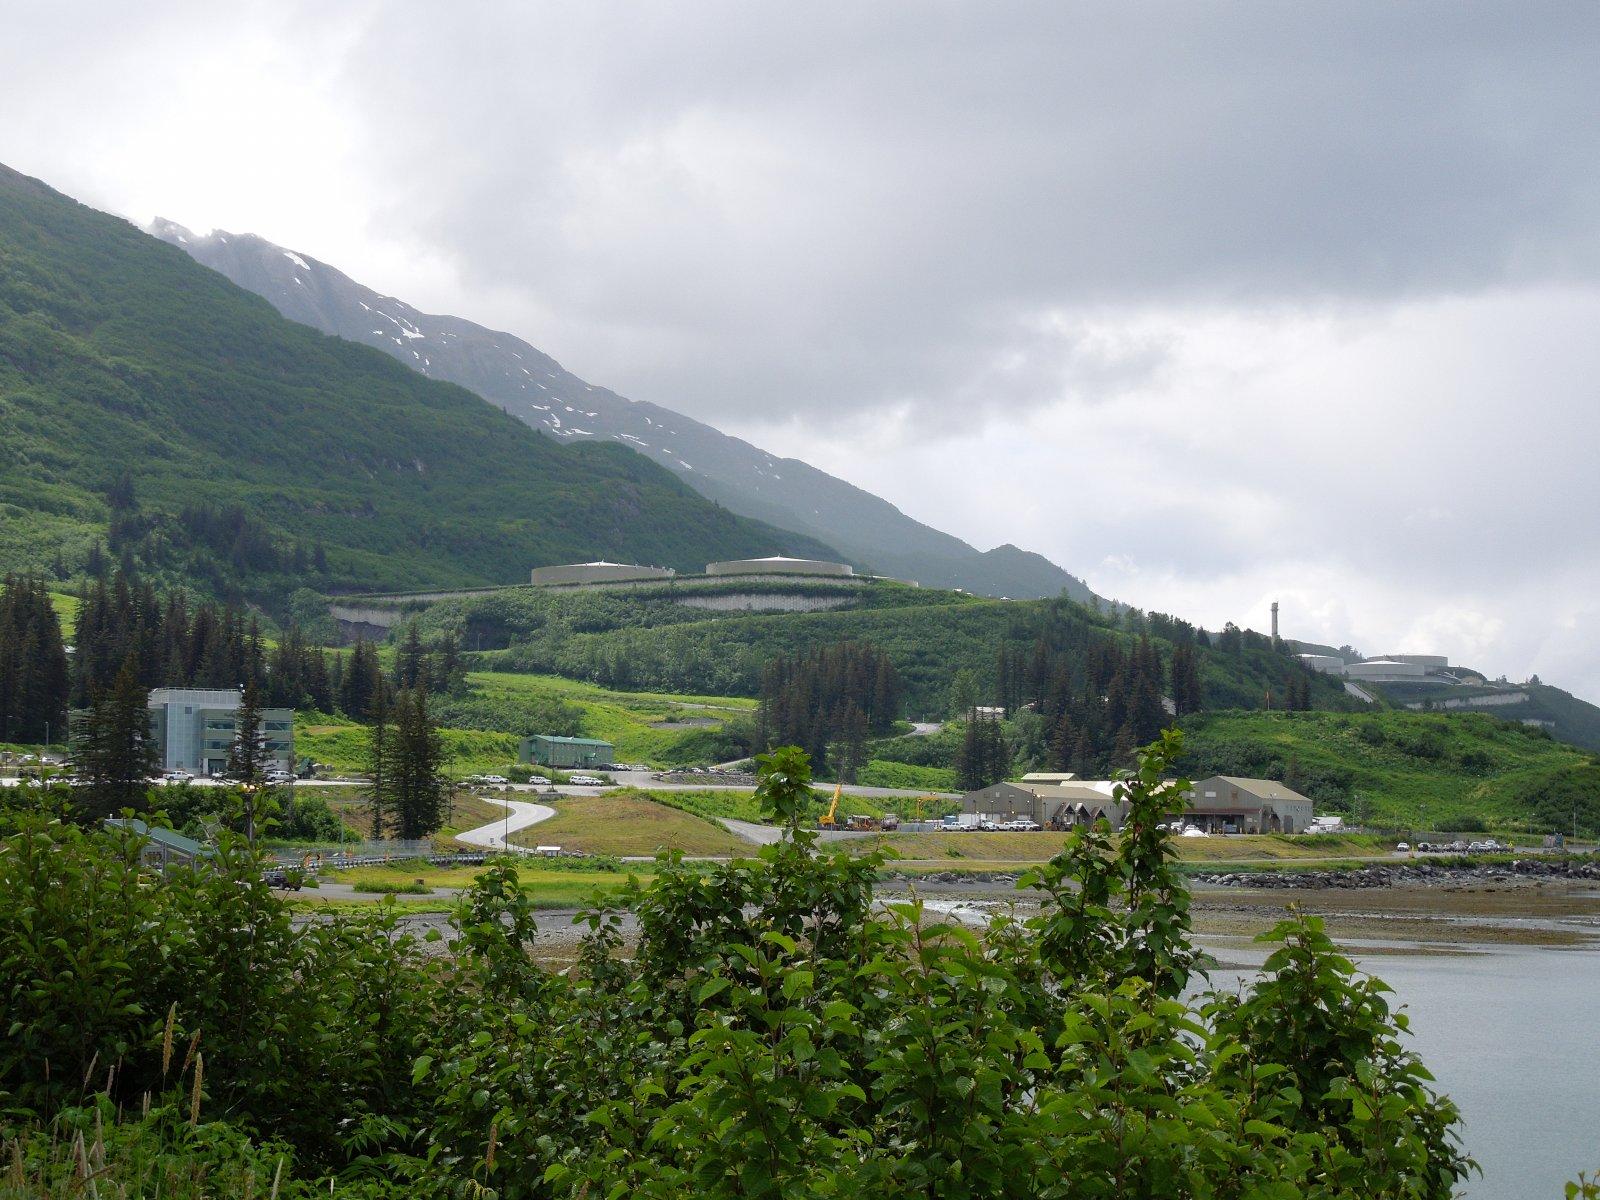 Click image for larger version  Name:Valdez to Copper River Center 053.jpg Views:62 Size:364.7 KB ID:215365